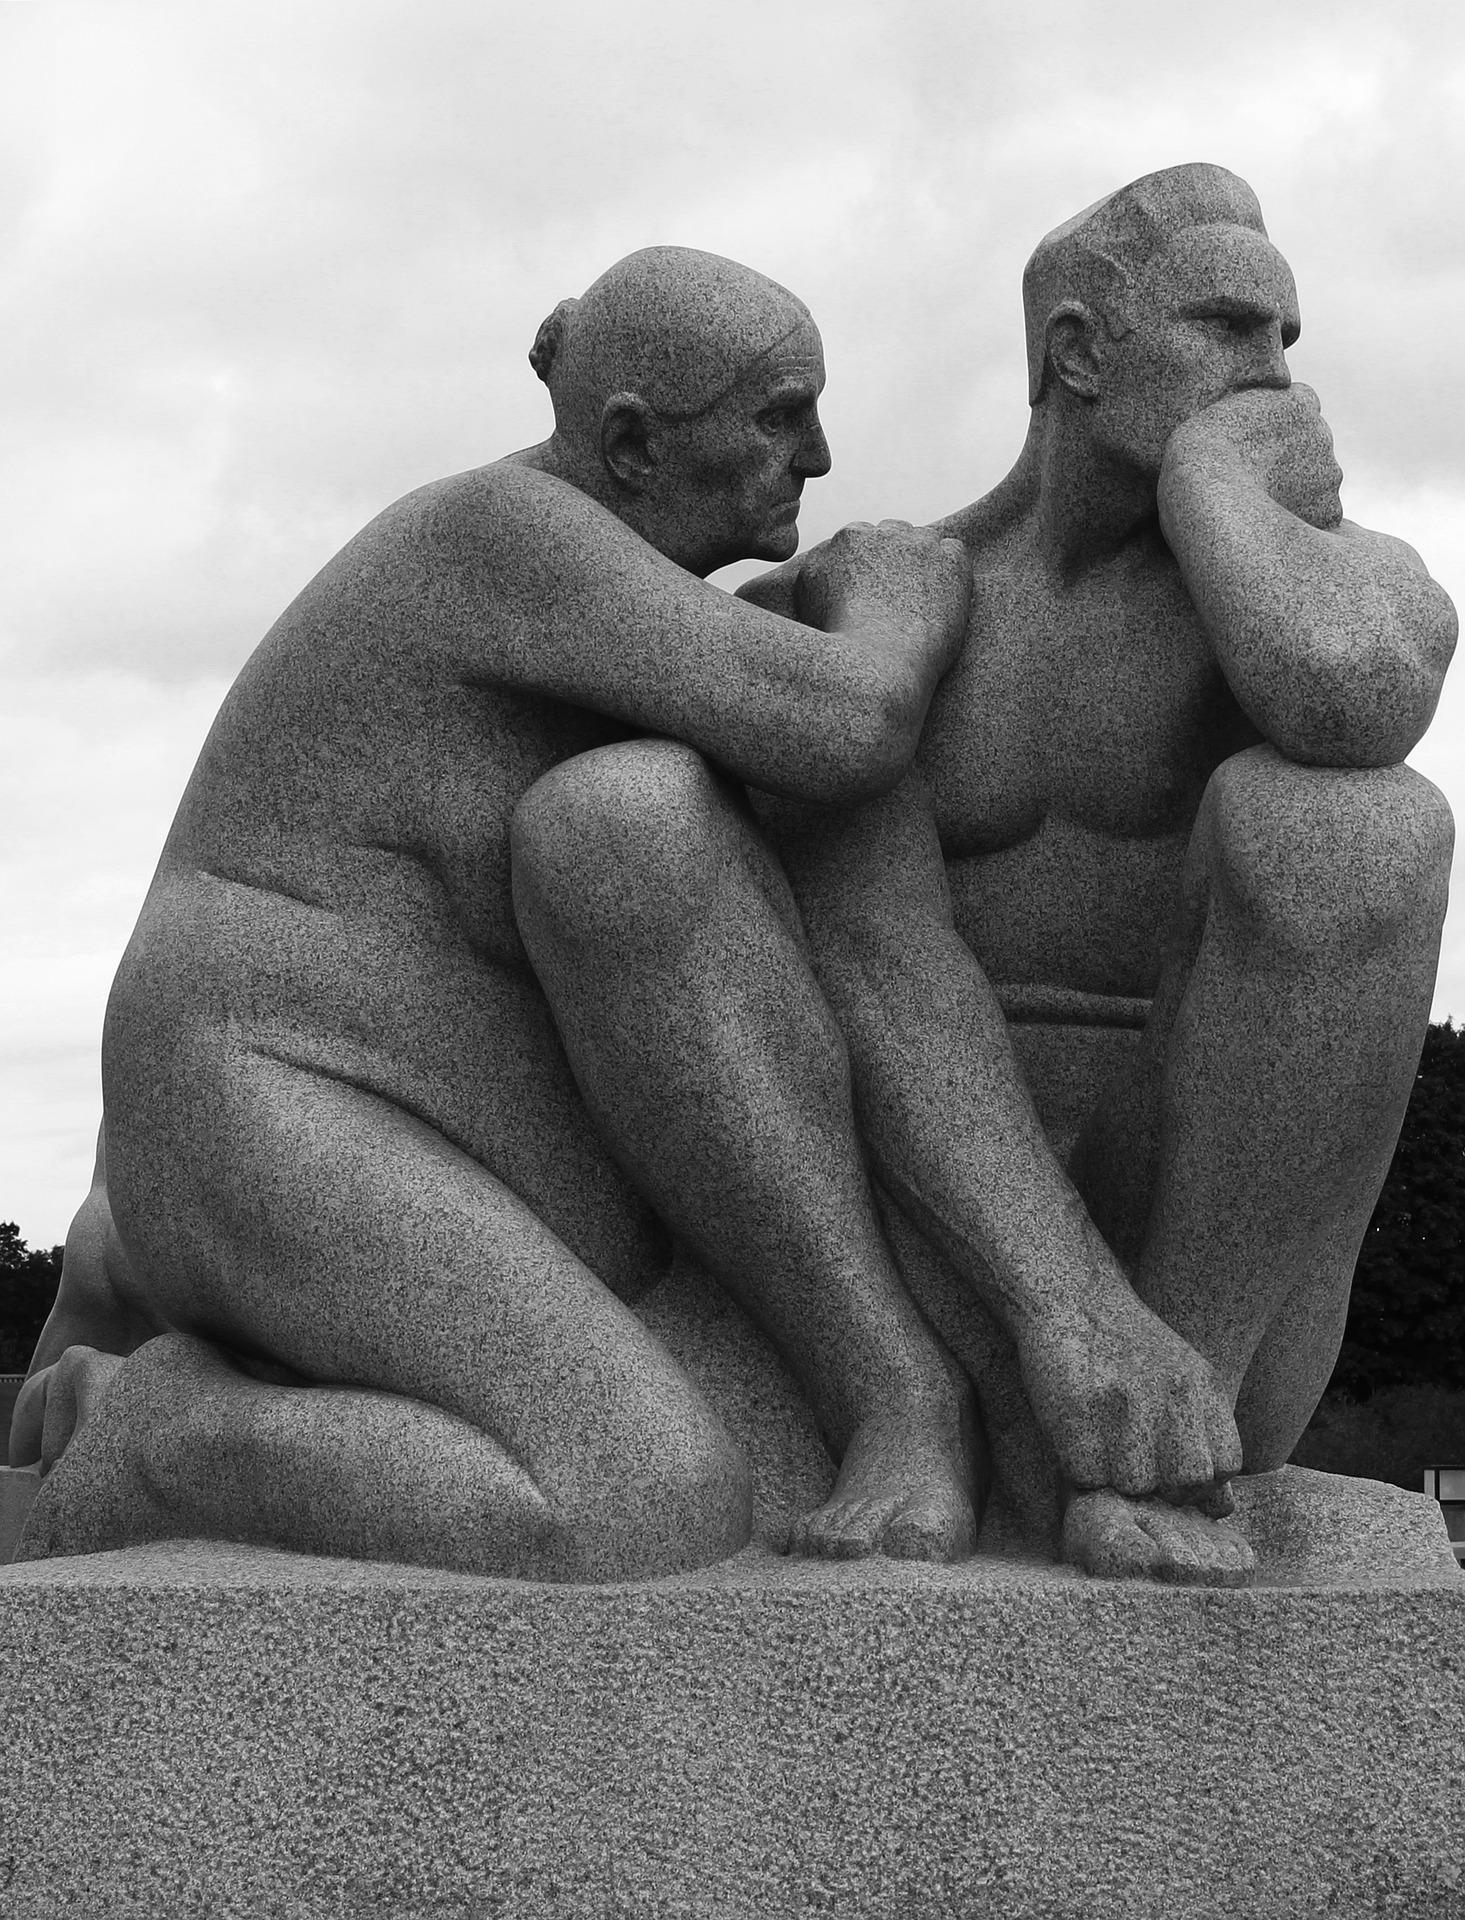 sculpture-2613506_1920